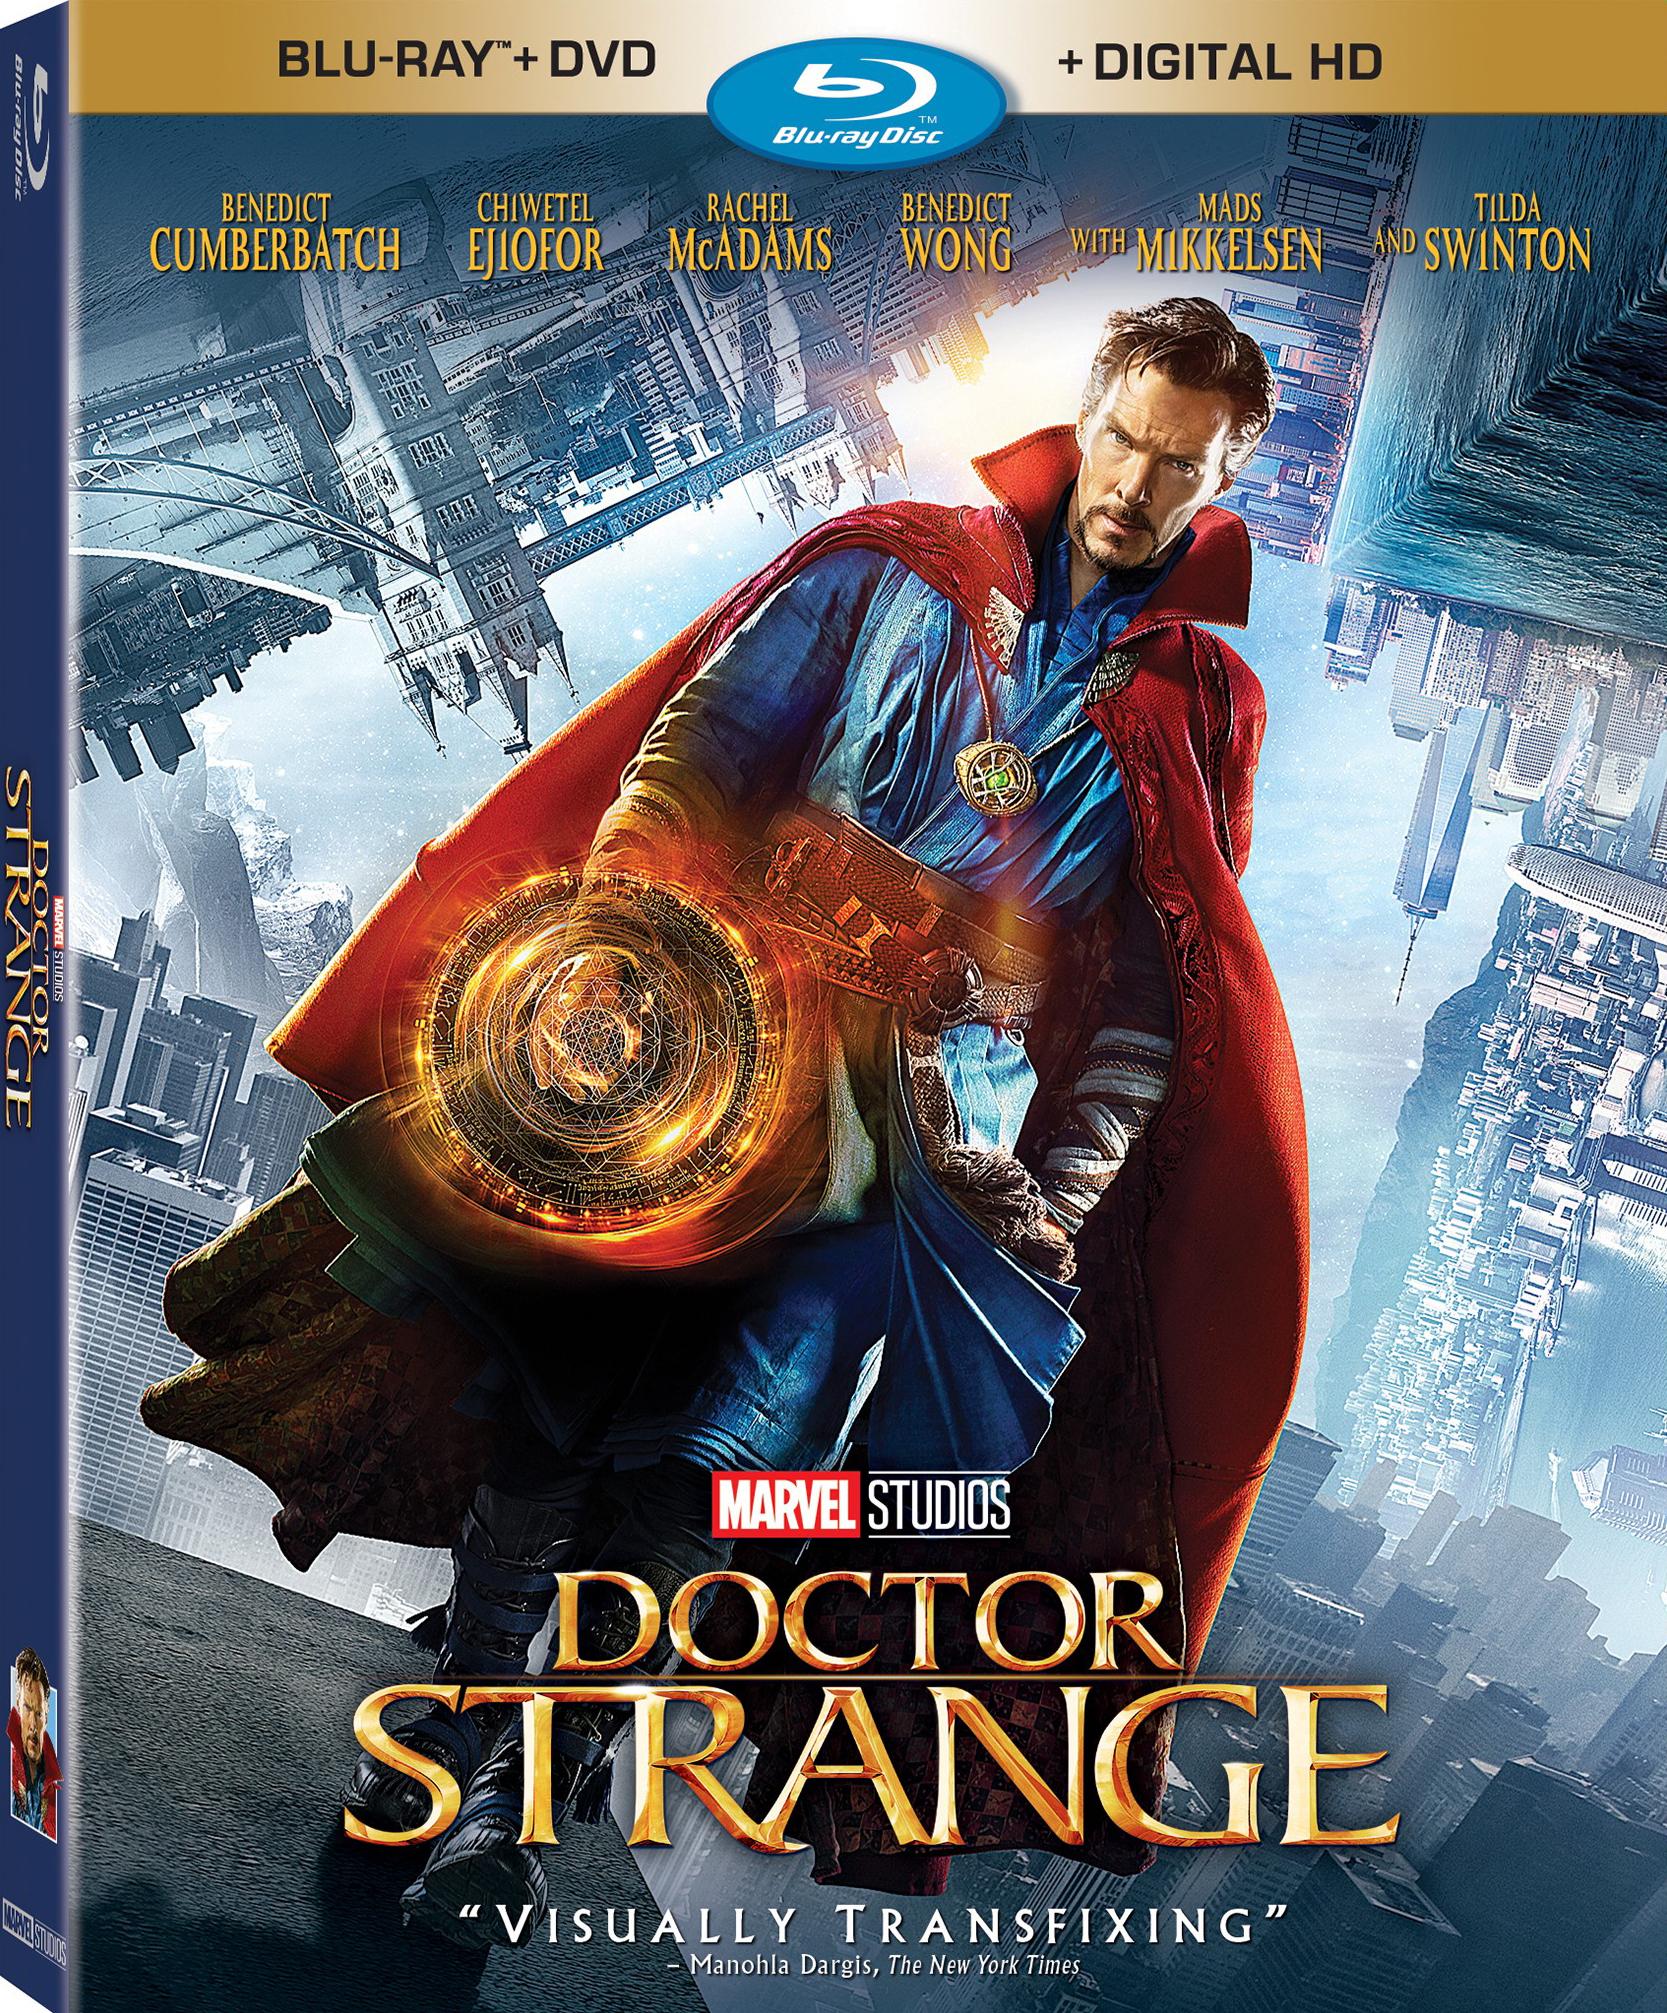 Doctor Strange(2016) poster image